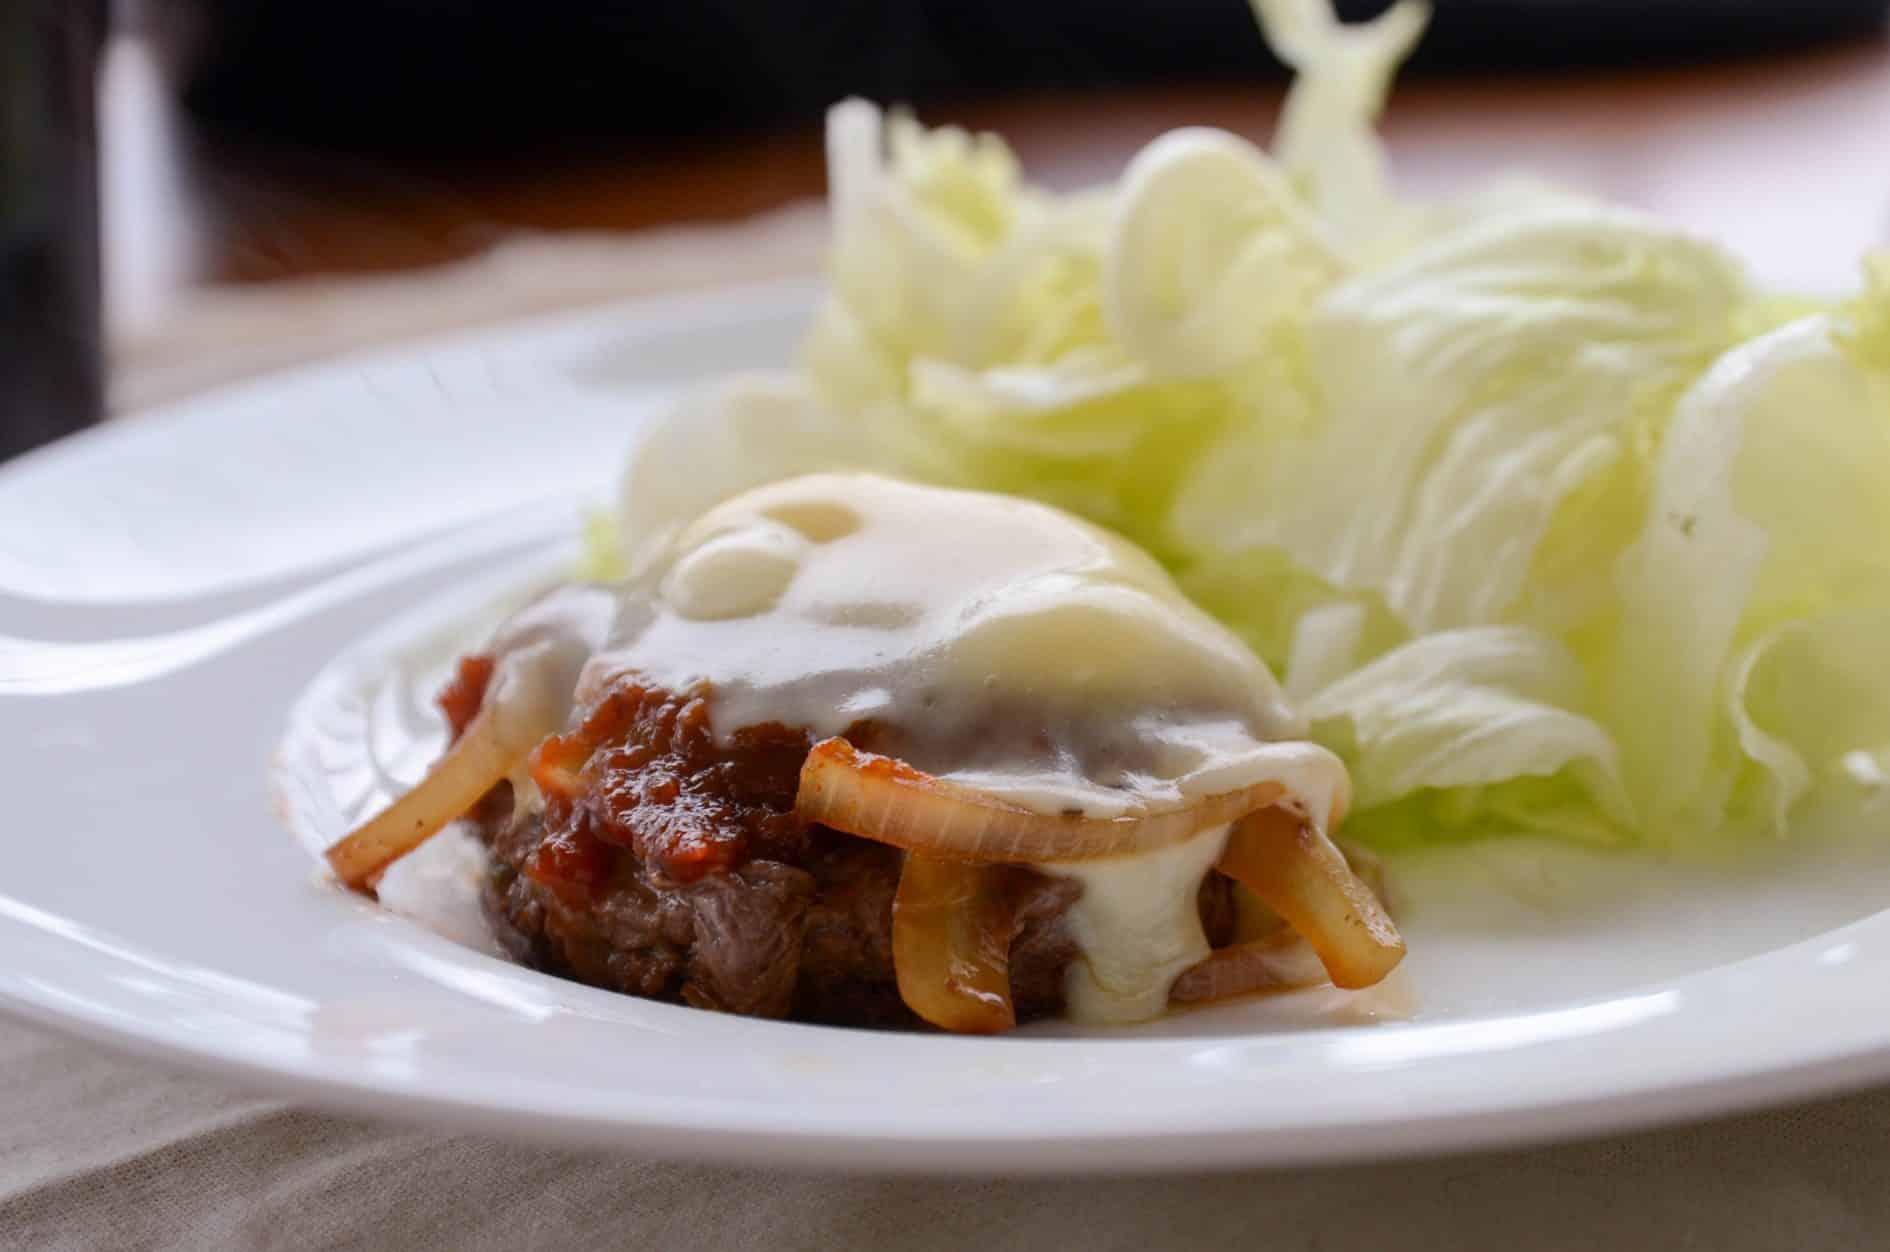 receita de hamburguer barbecue com queijo